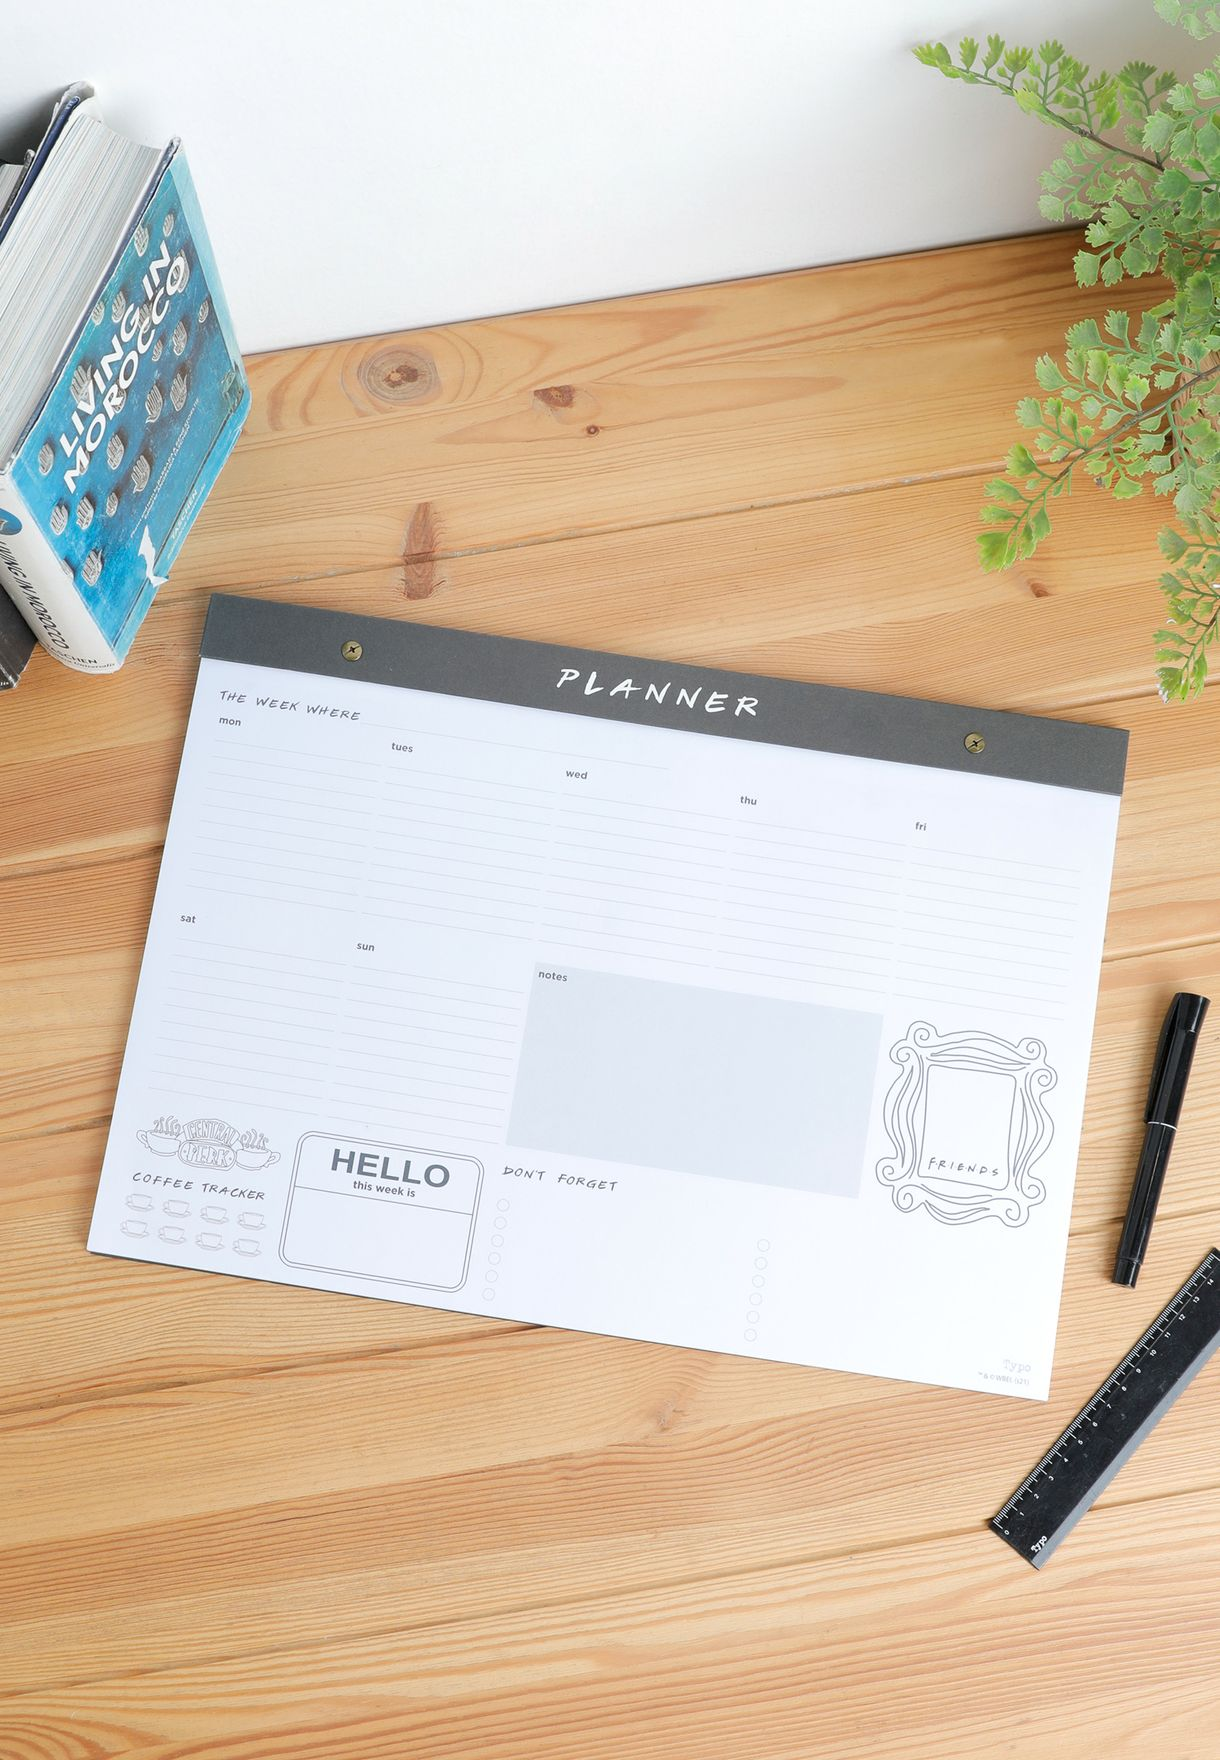 دفتر تخطيط A3 للمكتب